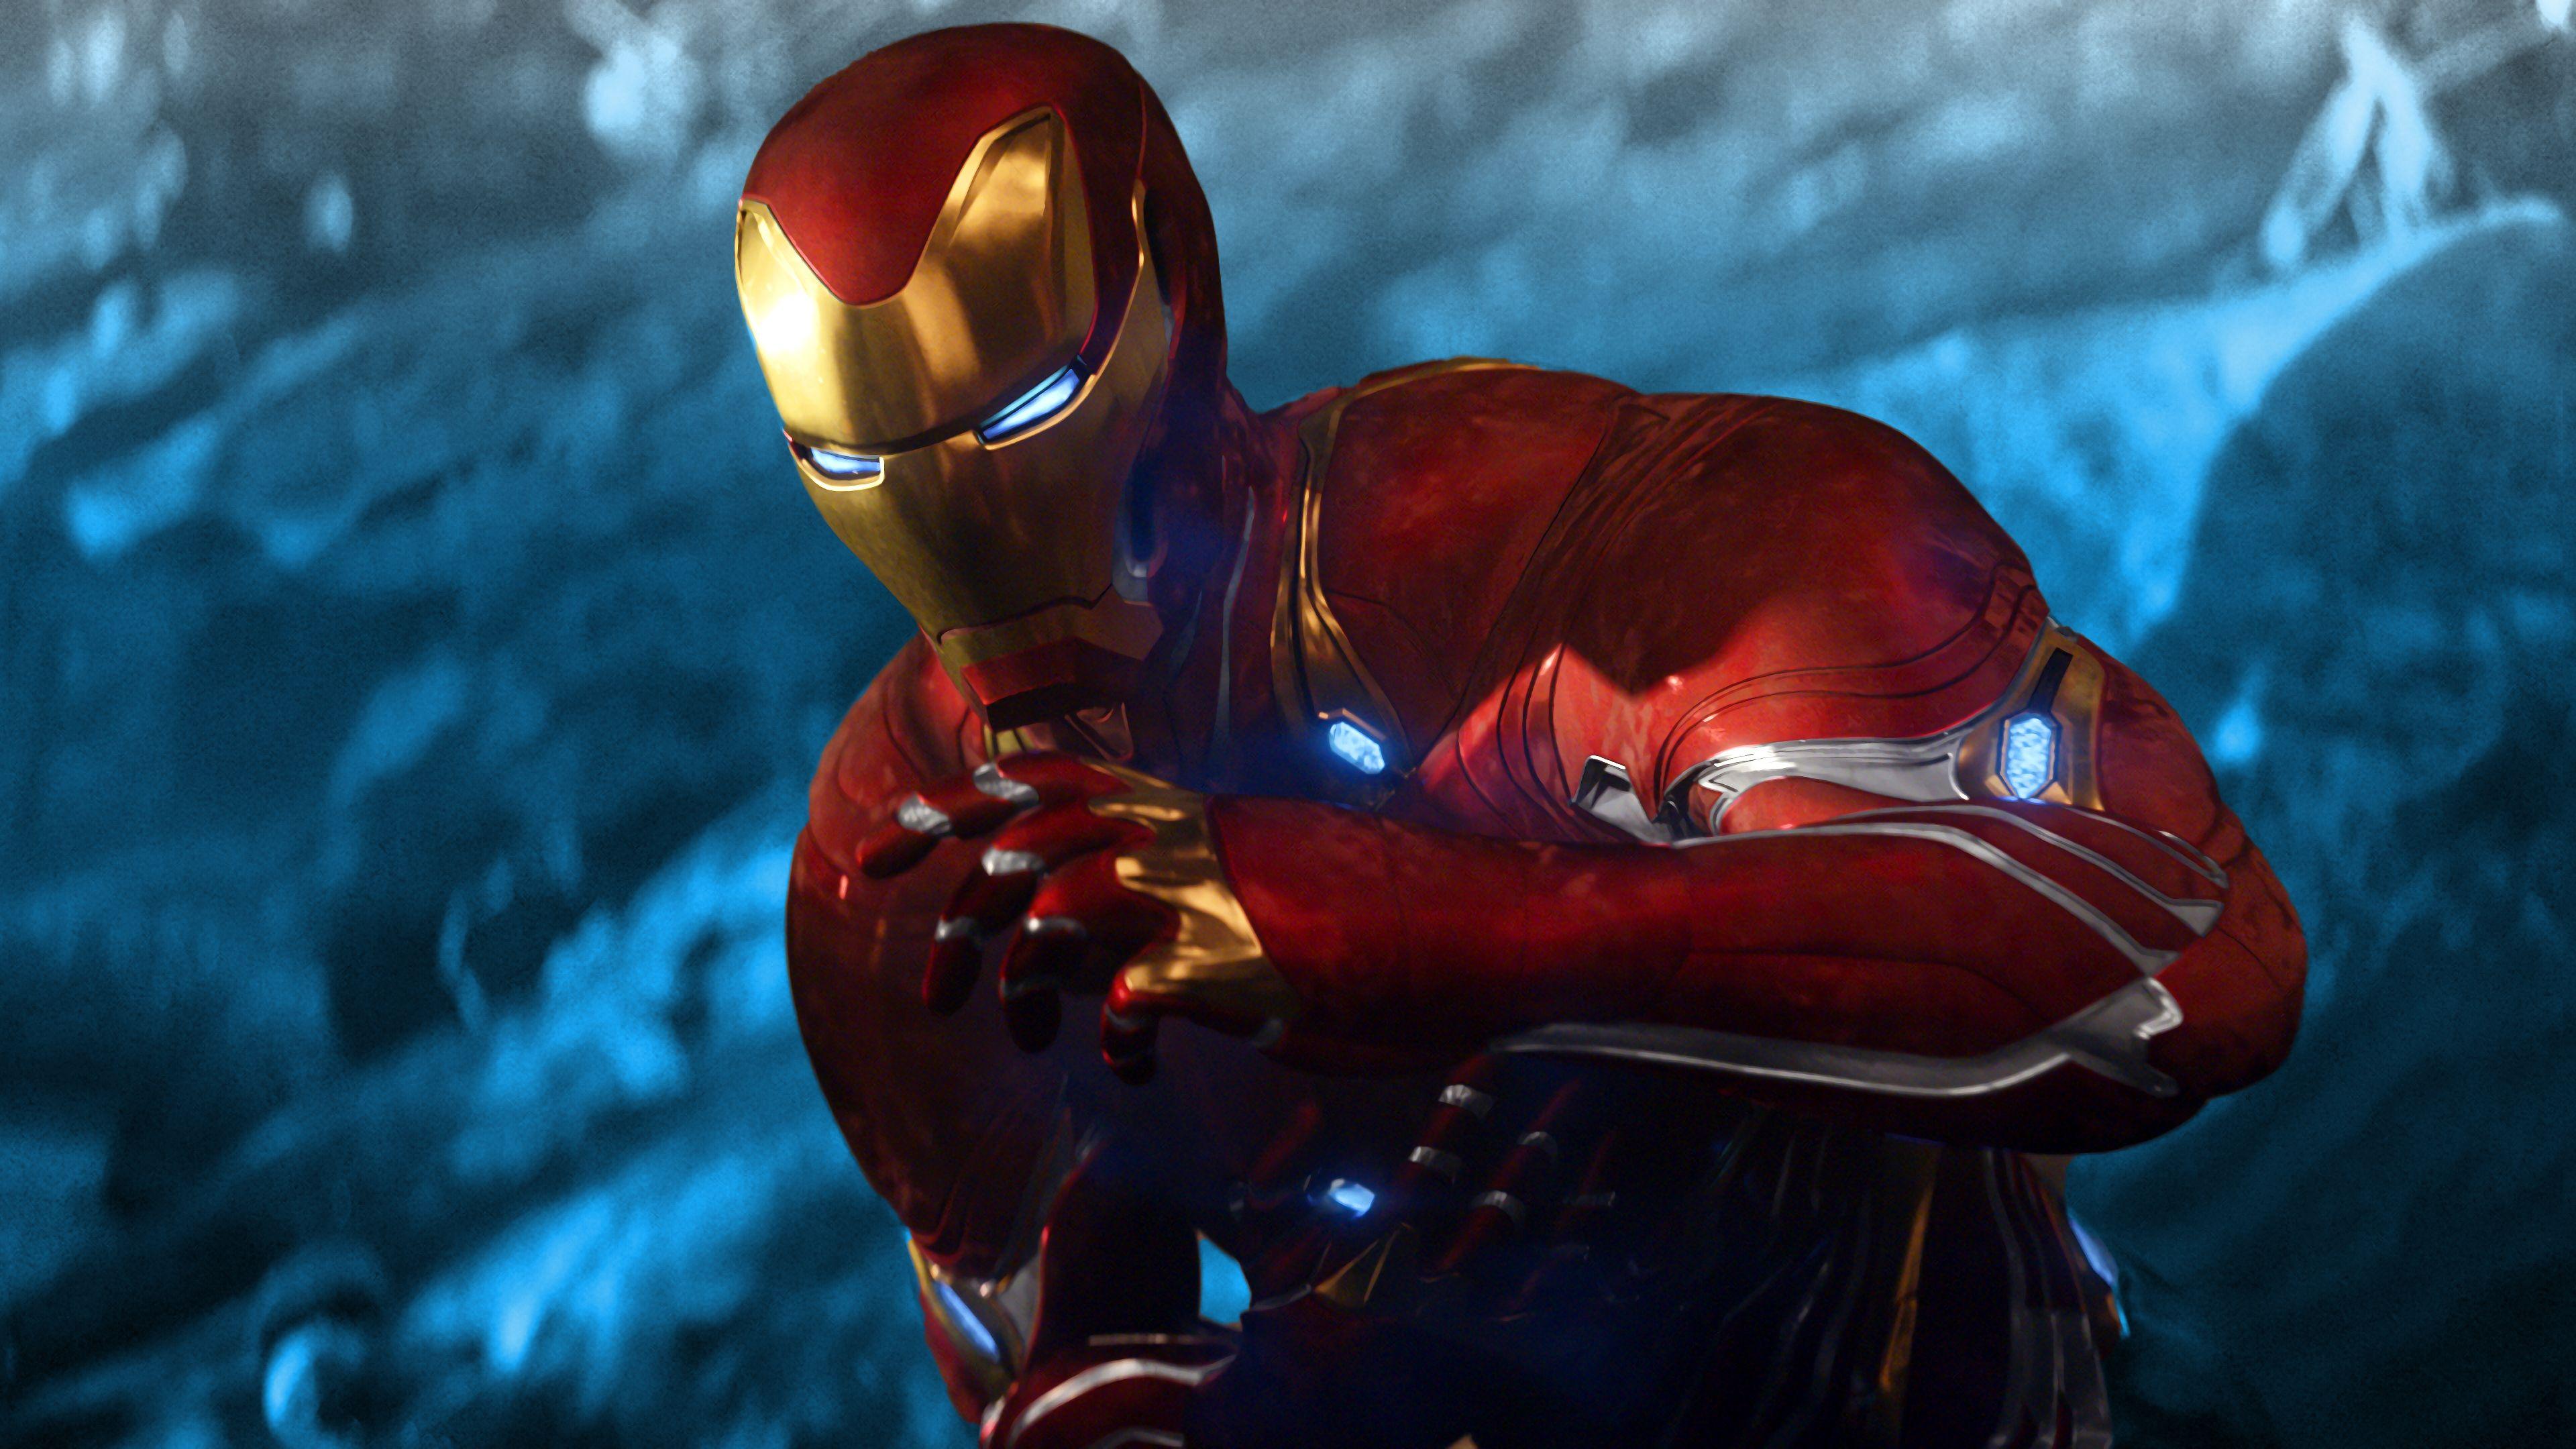 Iron Man Infinity War 4k superheroes wallpapers, iron man